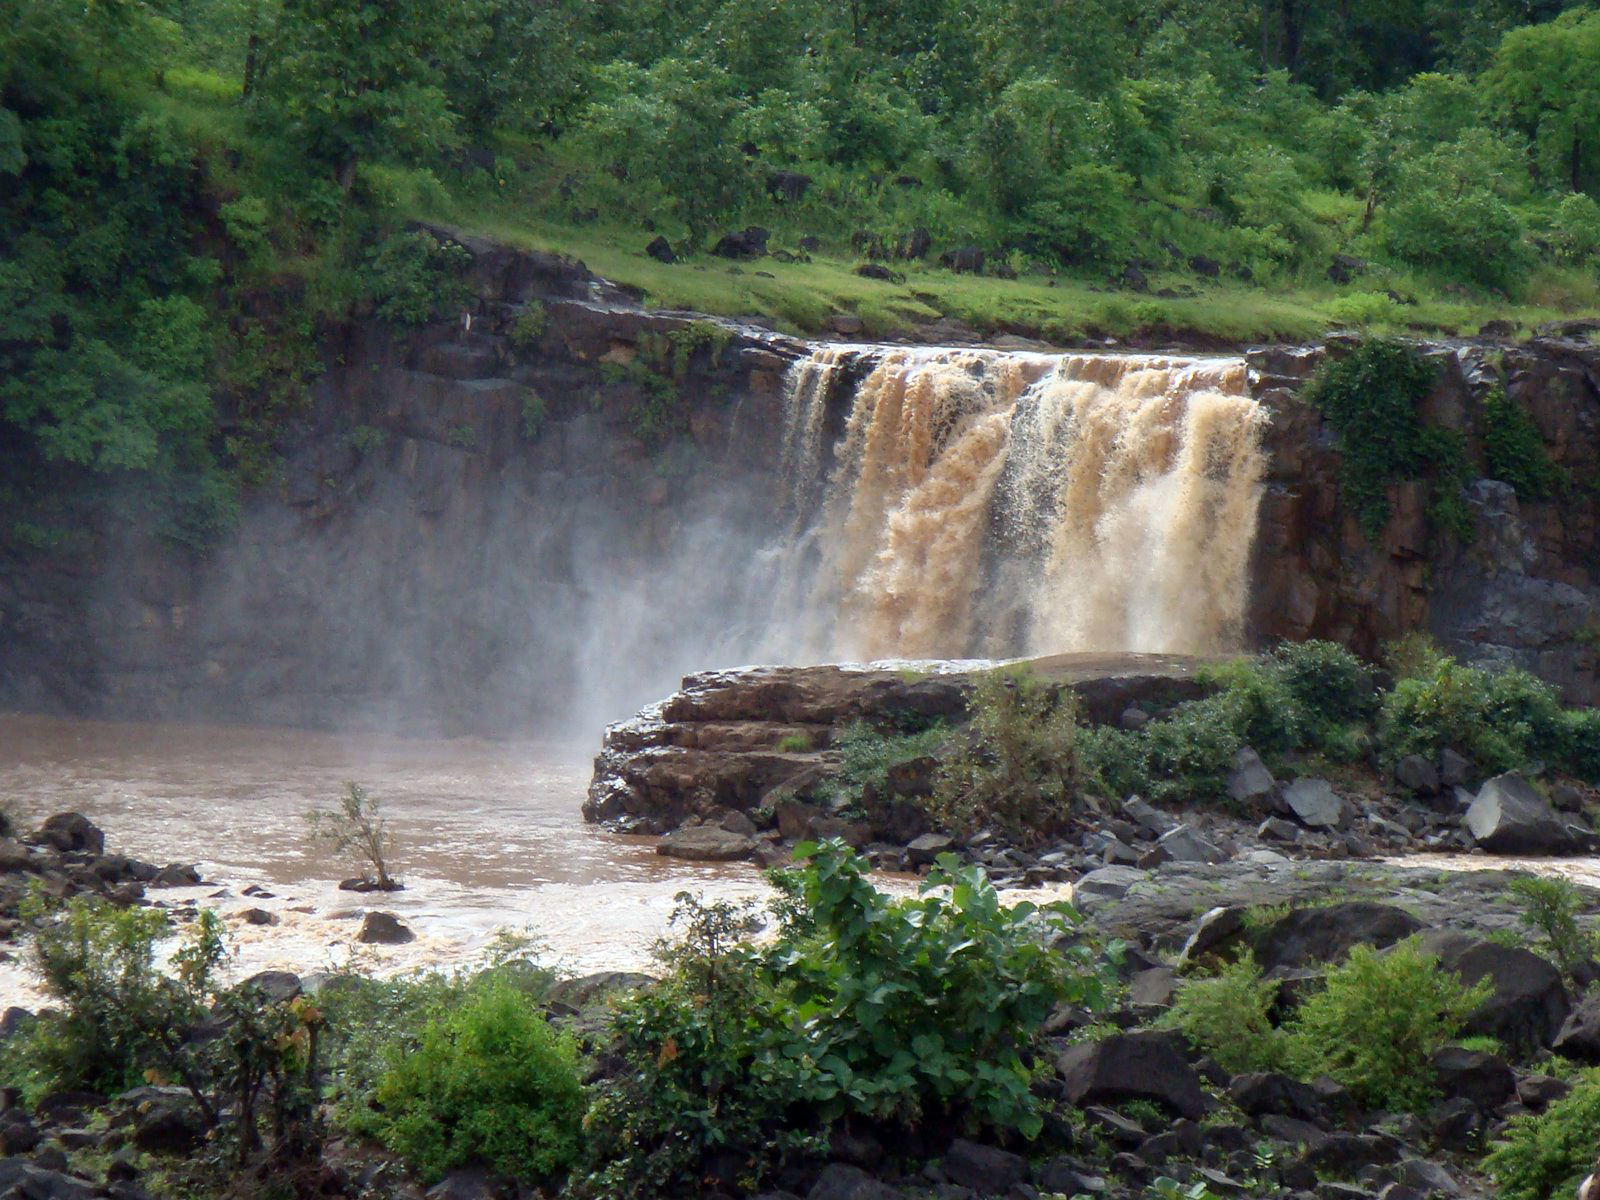 Saputara India  city pictures gallery : Undiscovered Indian Treasures: Saputara: Gushing Waterfalls, Drifting ...